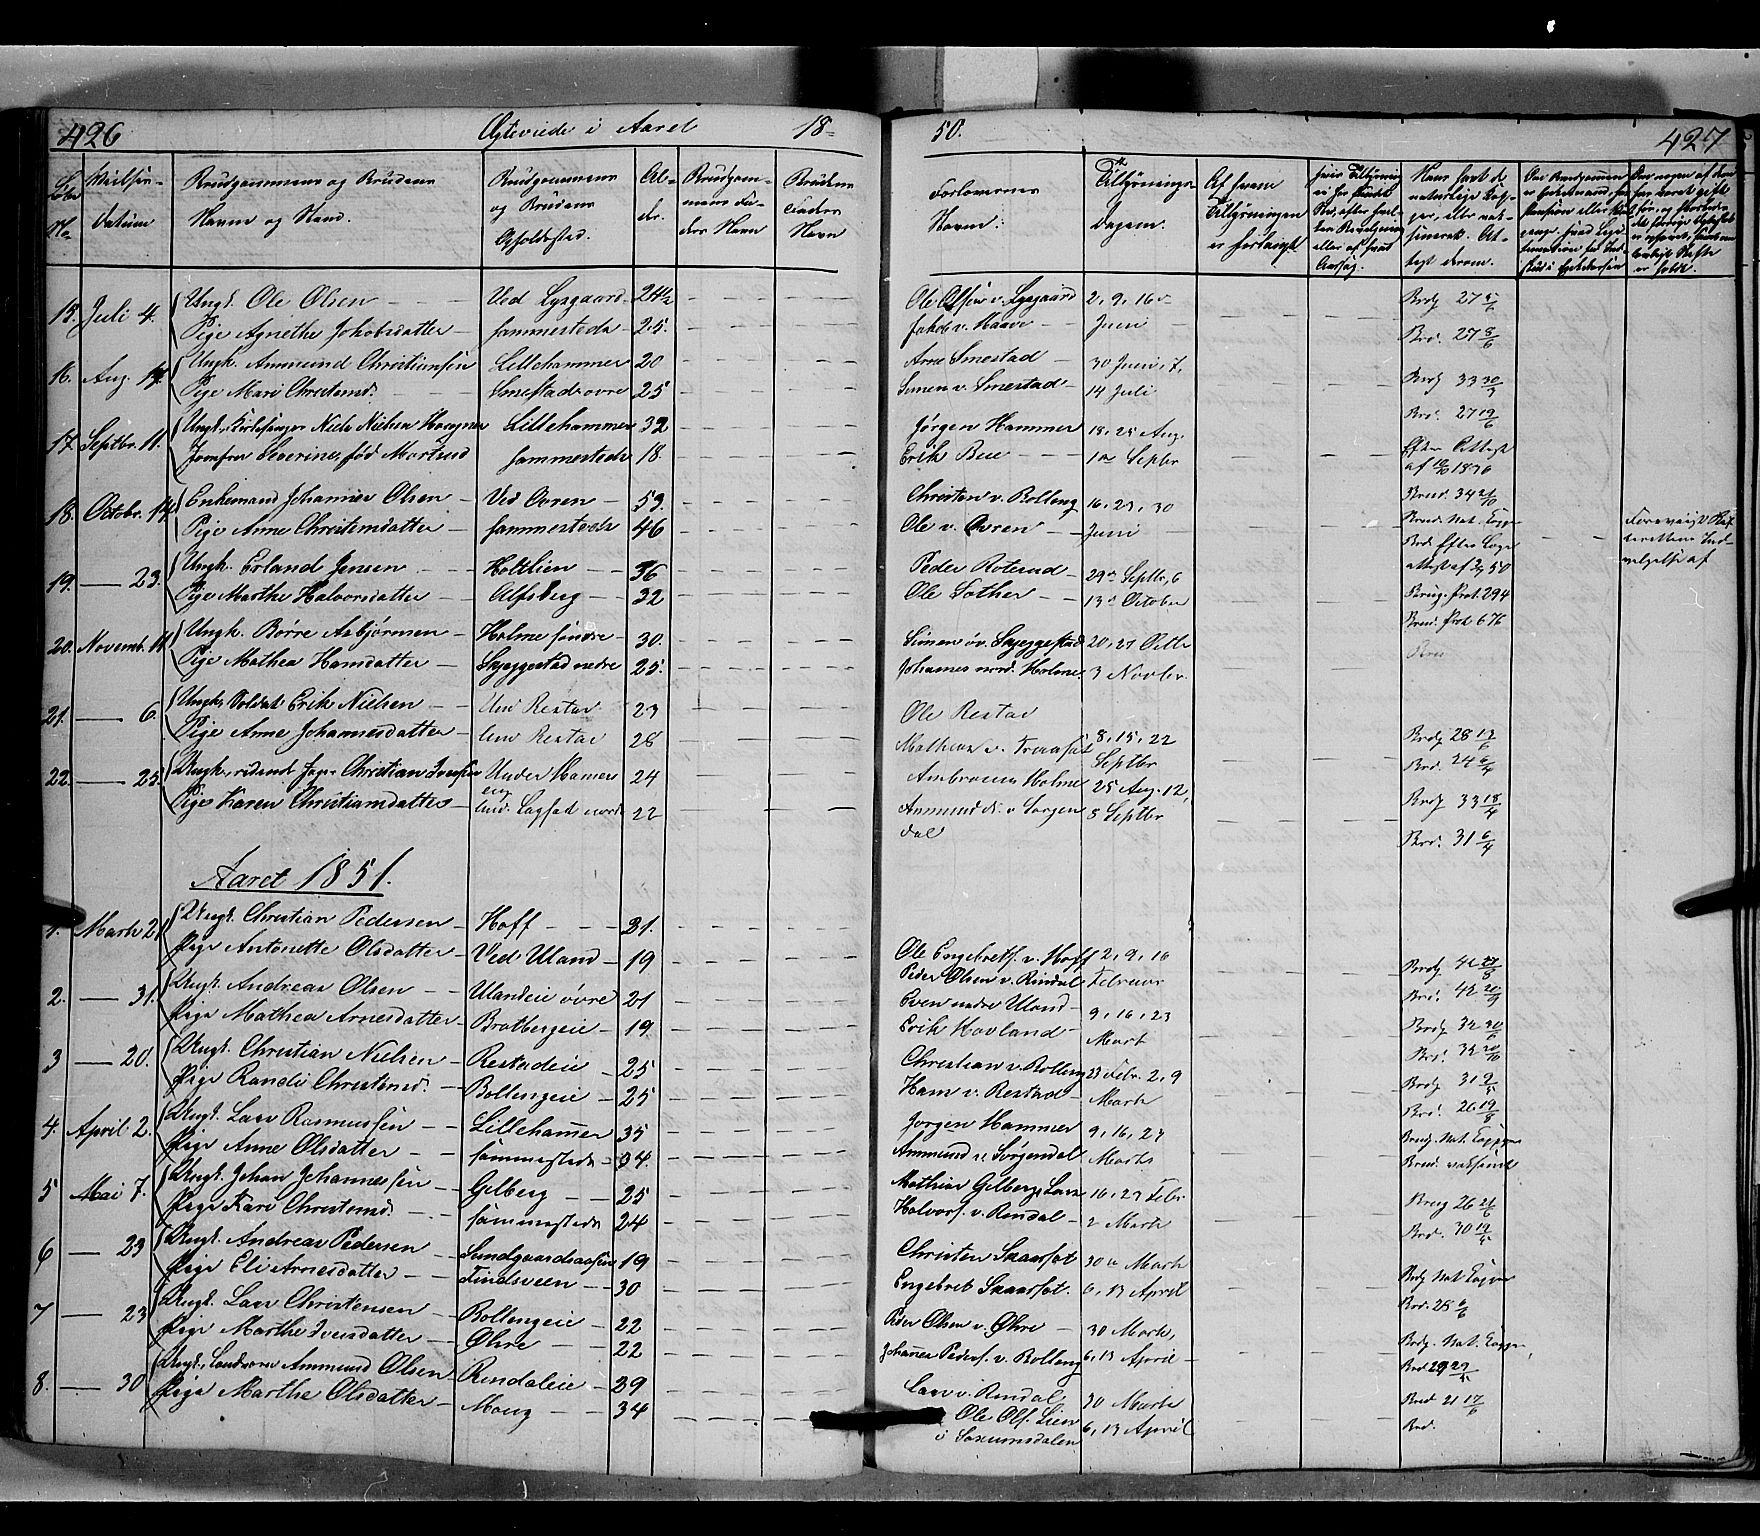 SAH, Fåberg prestekontor, Klokkerbok nr. 6, 1837-1855, s. 426-427